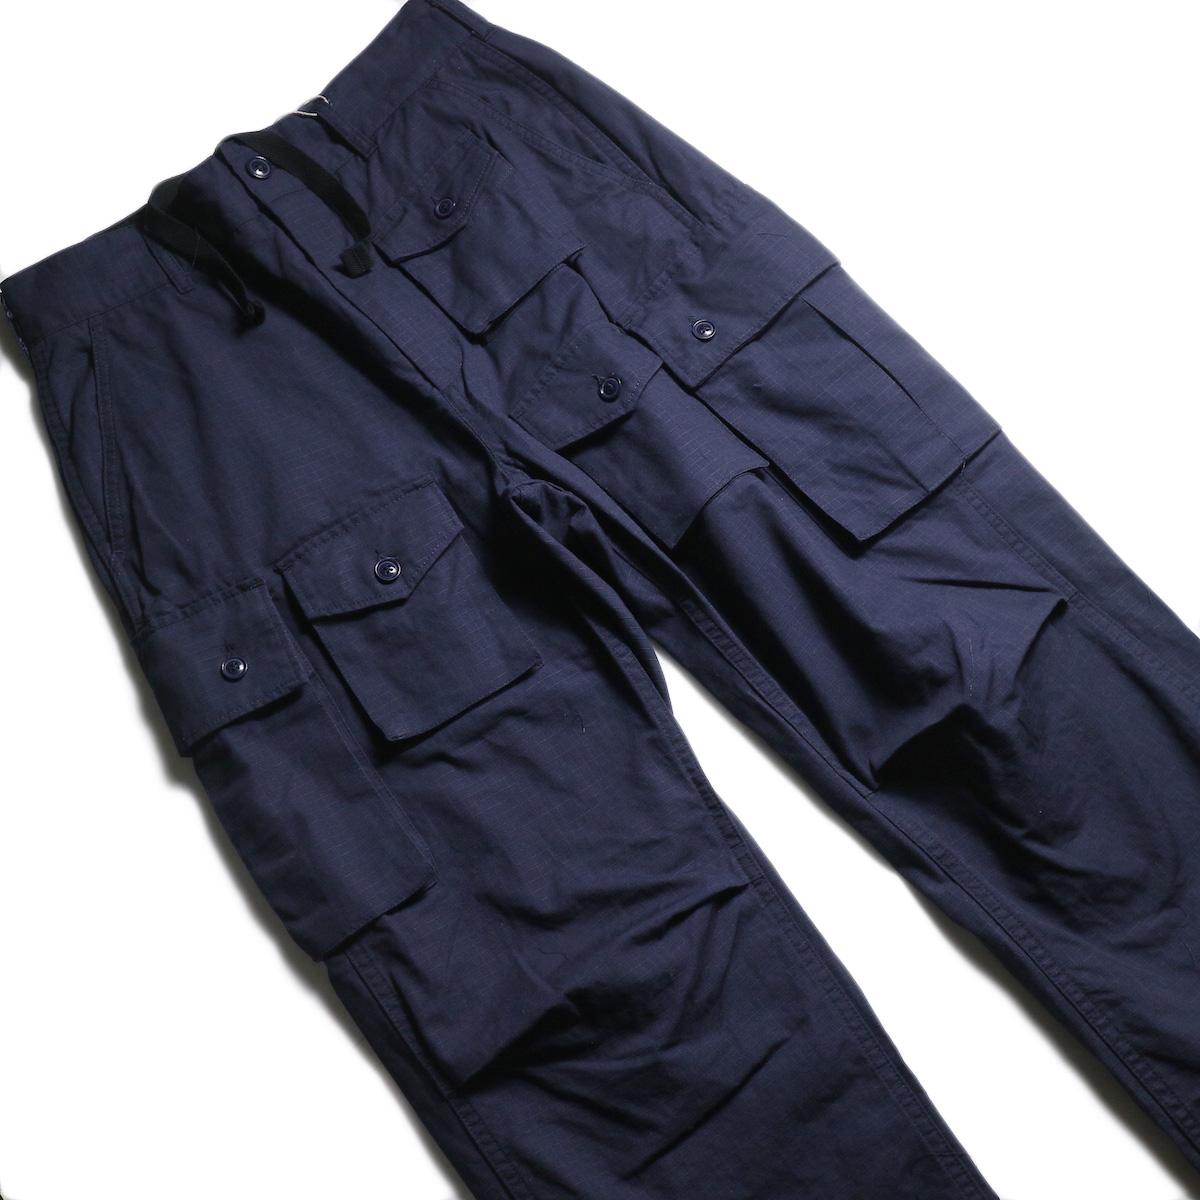 ENGINEERED GARMENTS /  FA Pant -Cotton Ripstop (Navy)  ウエスト